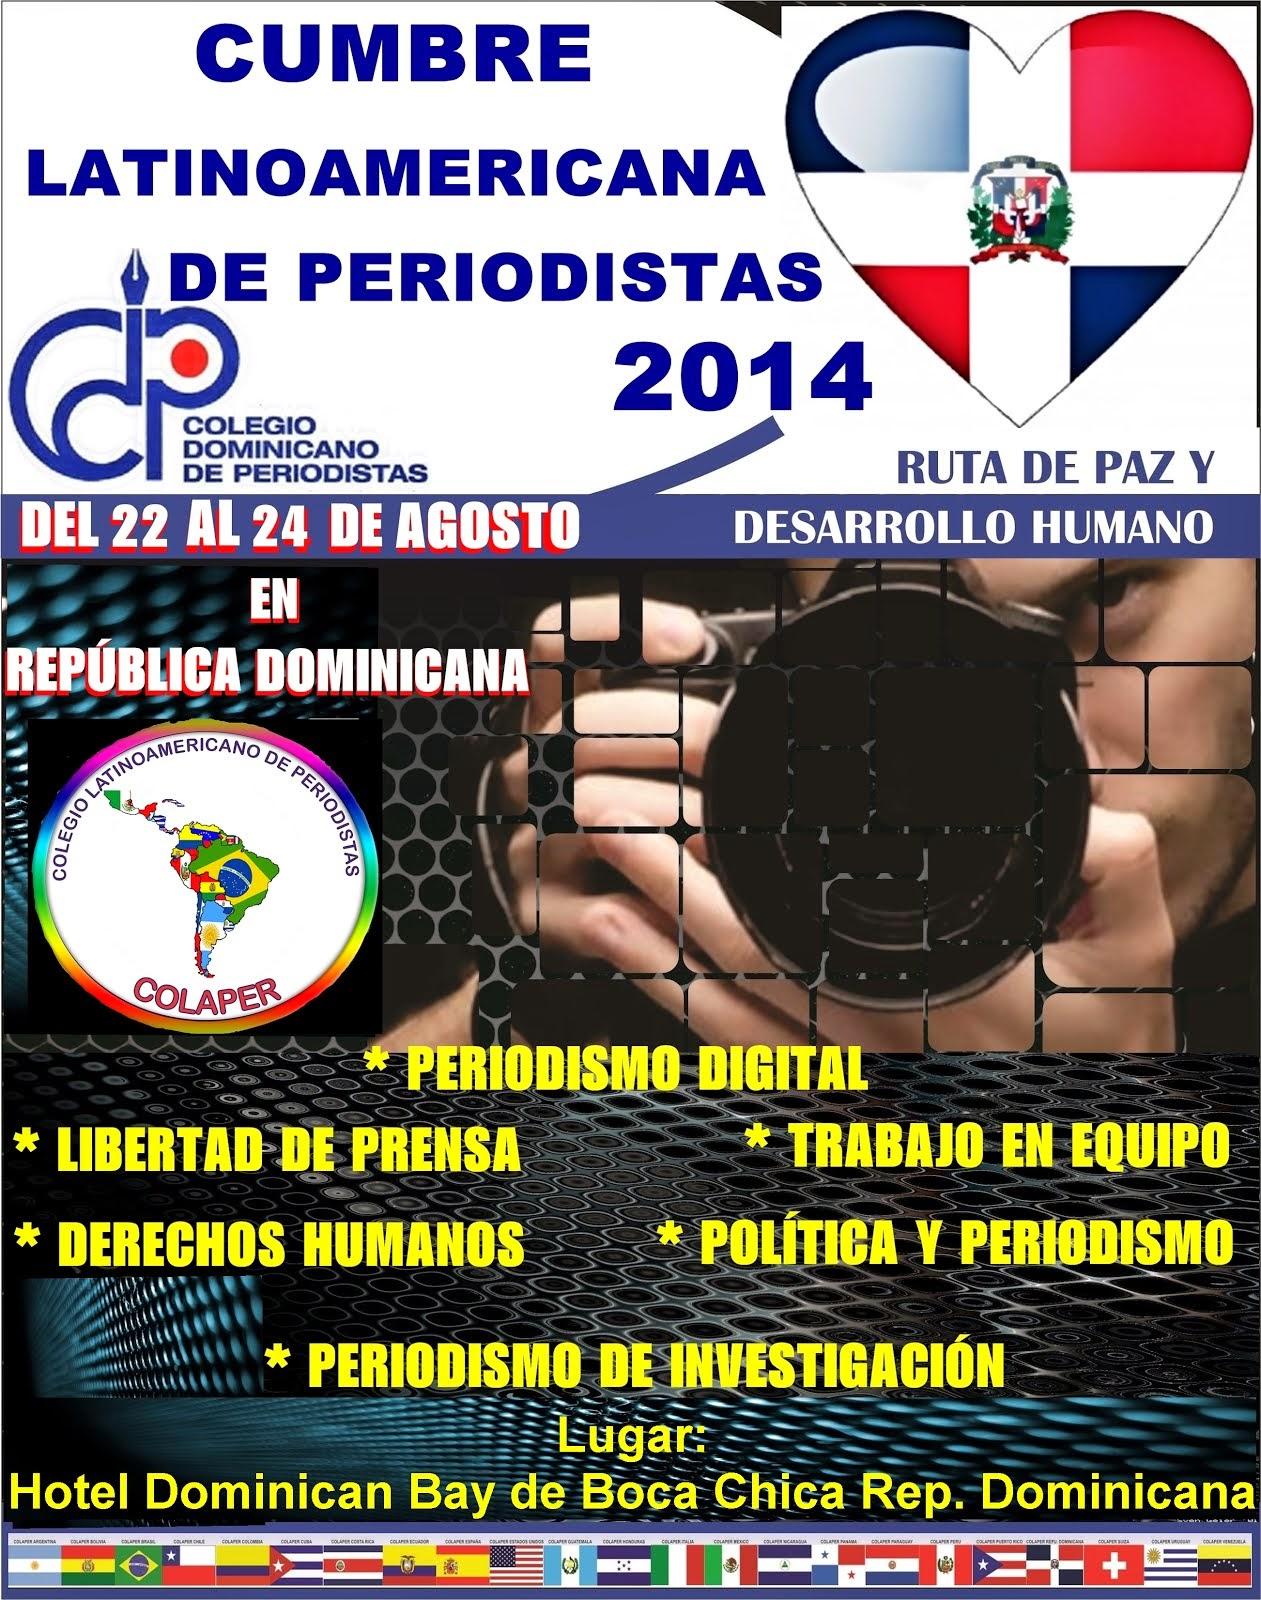 Cumbre Latinoamericana de Periodistas